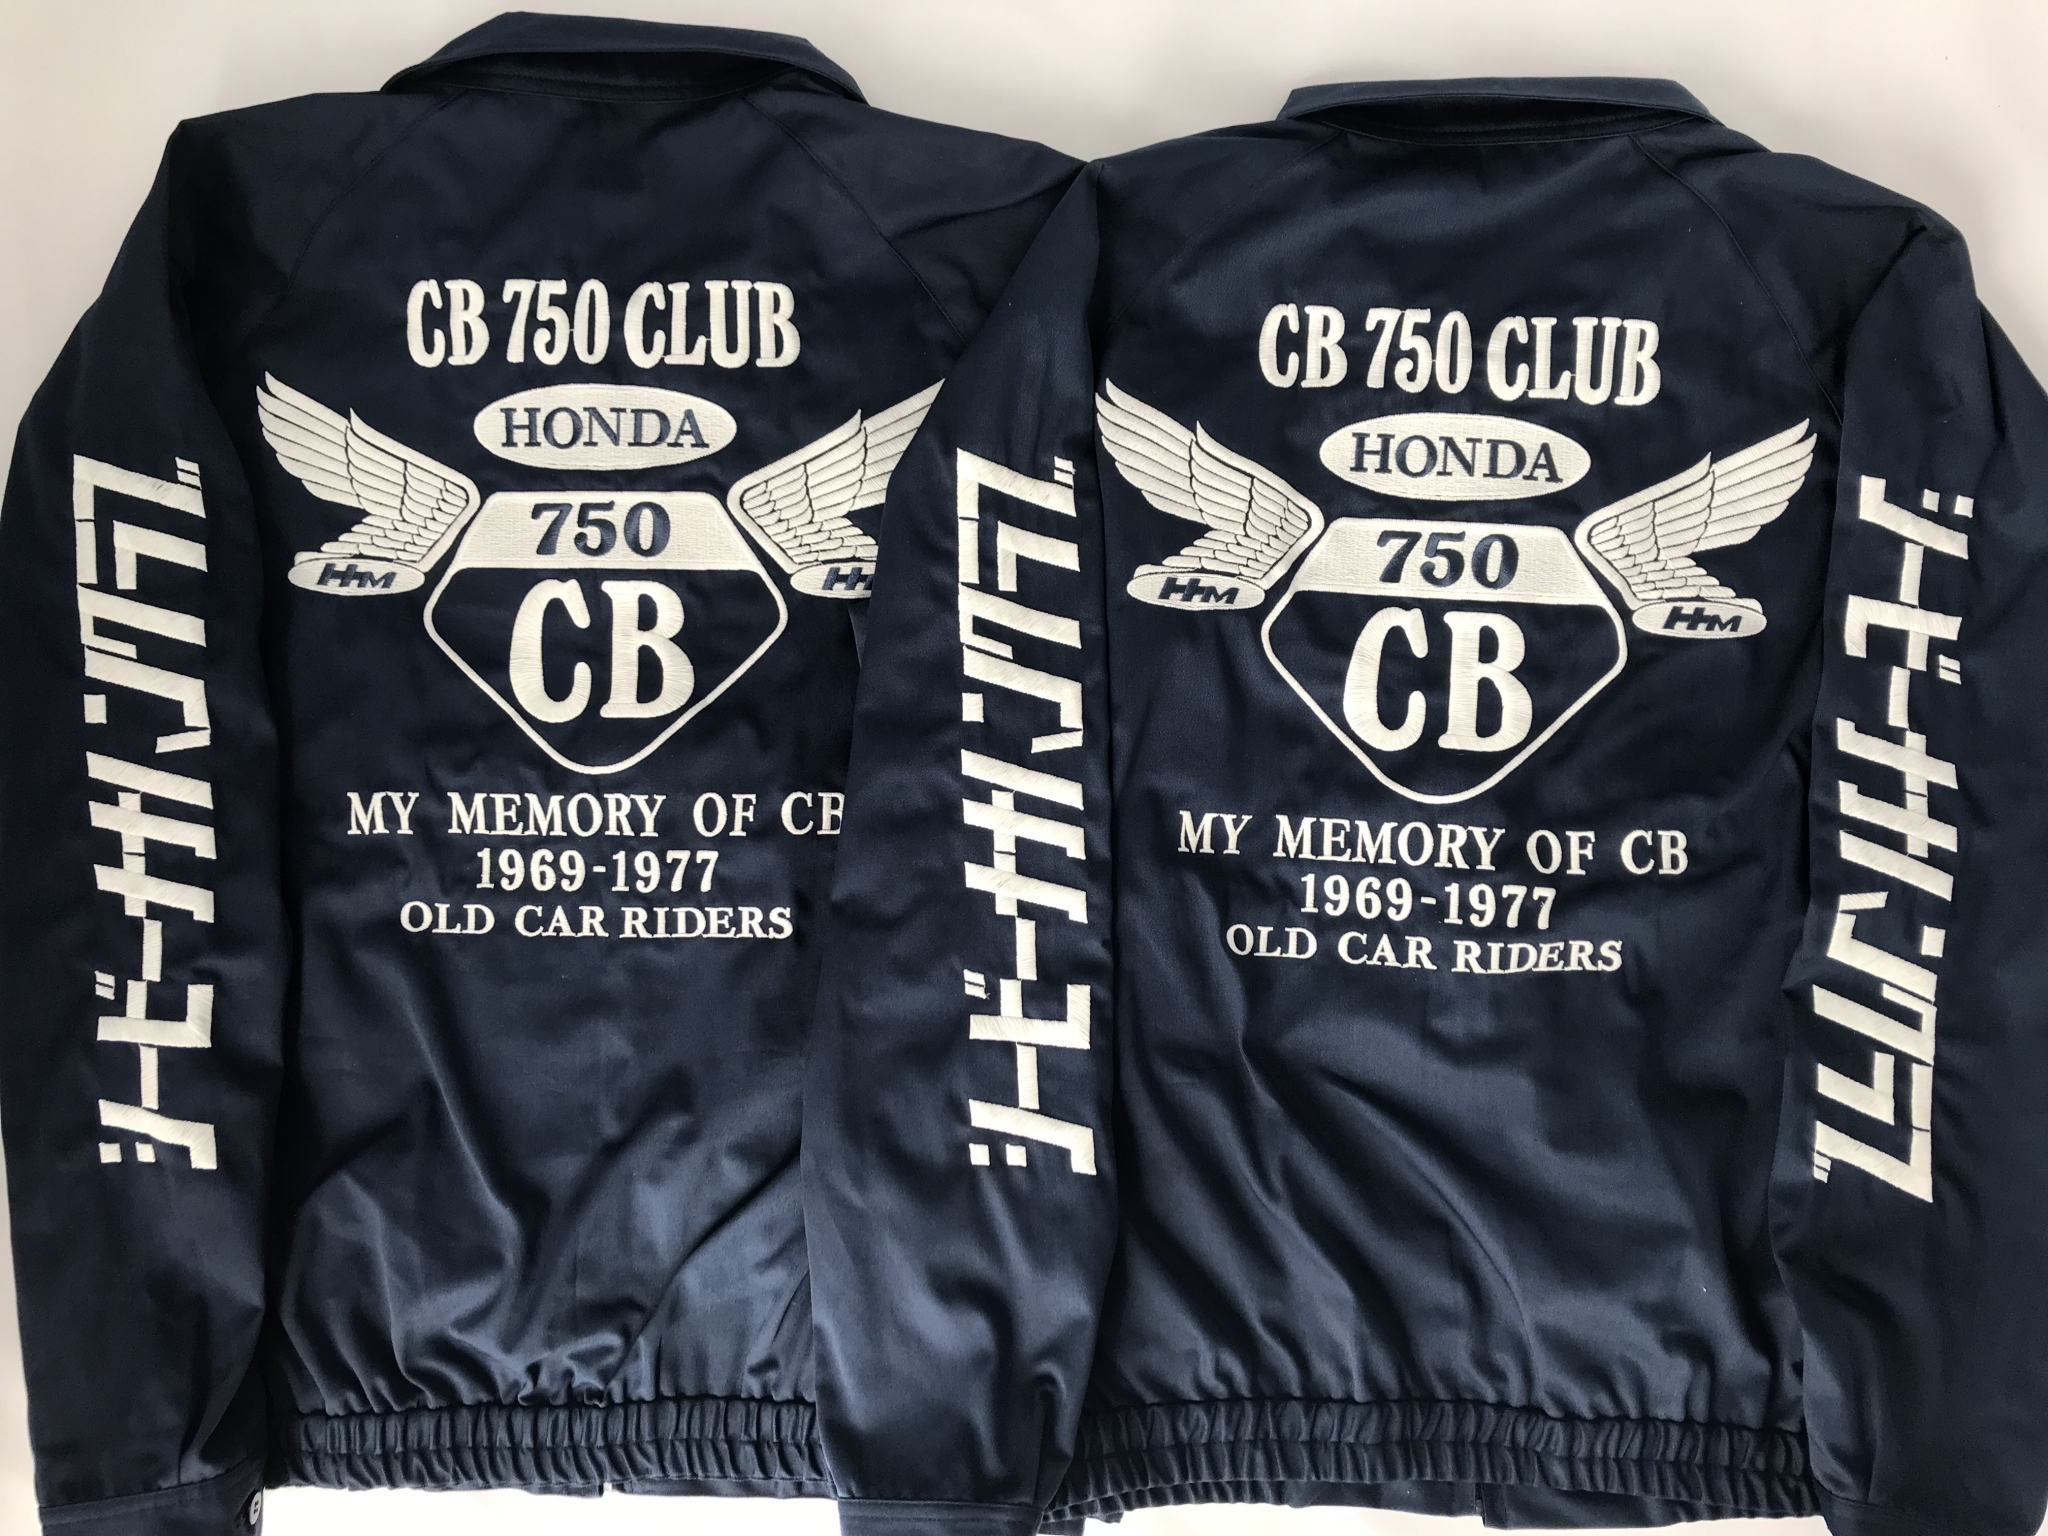 C54803F4-DEBE-4ACF-9371-840D221293B4